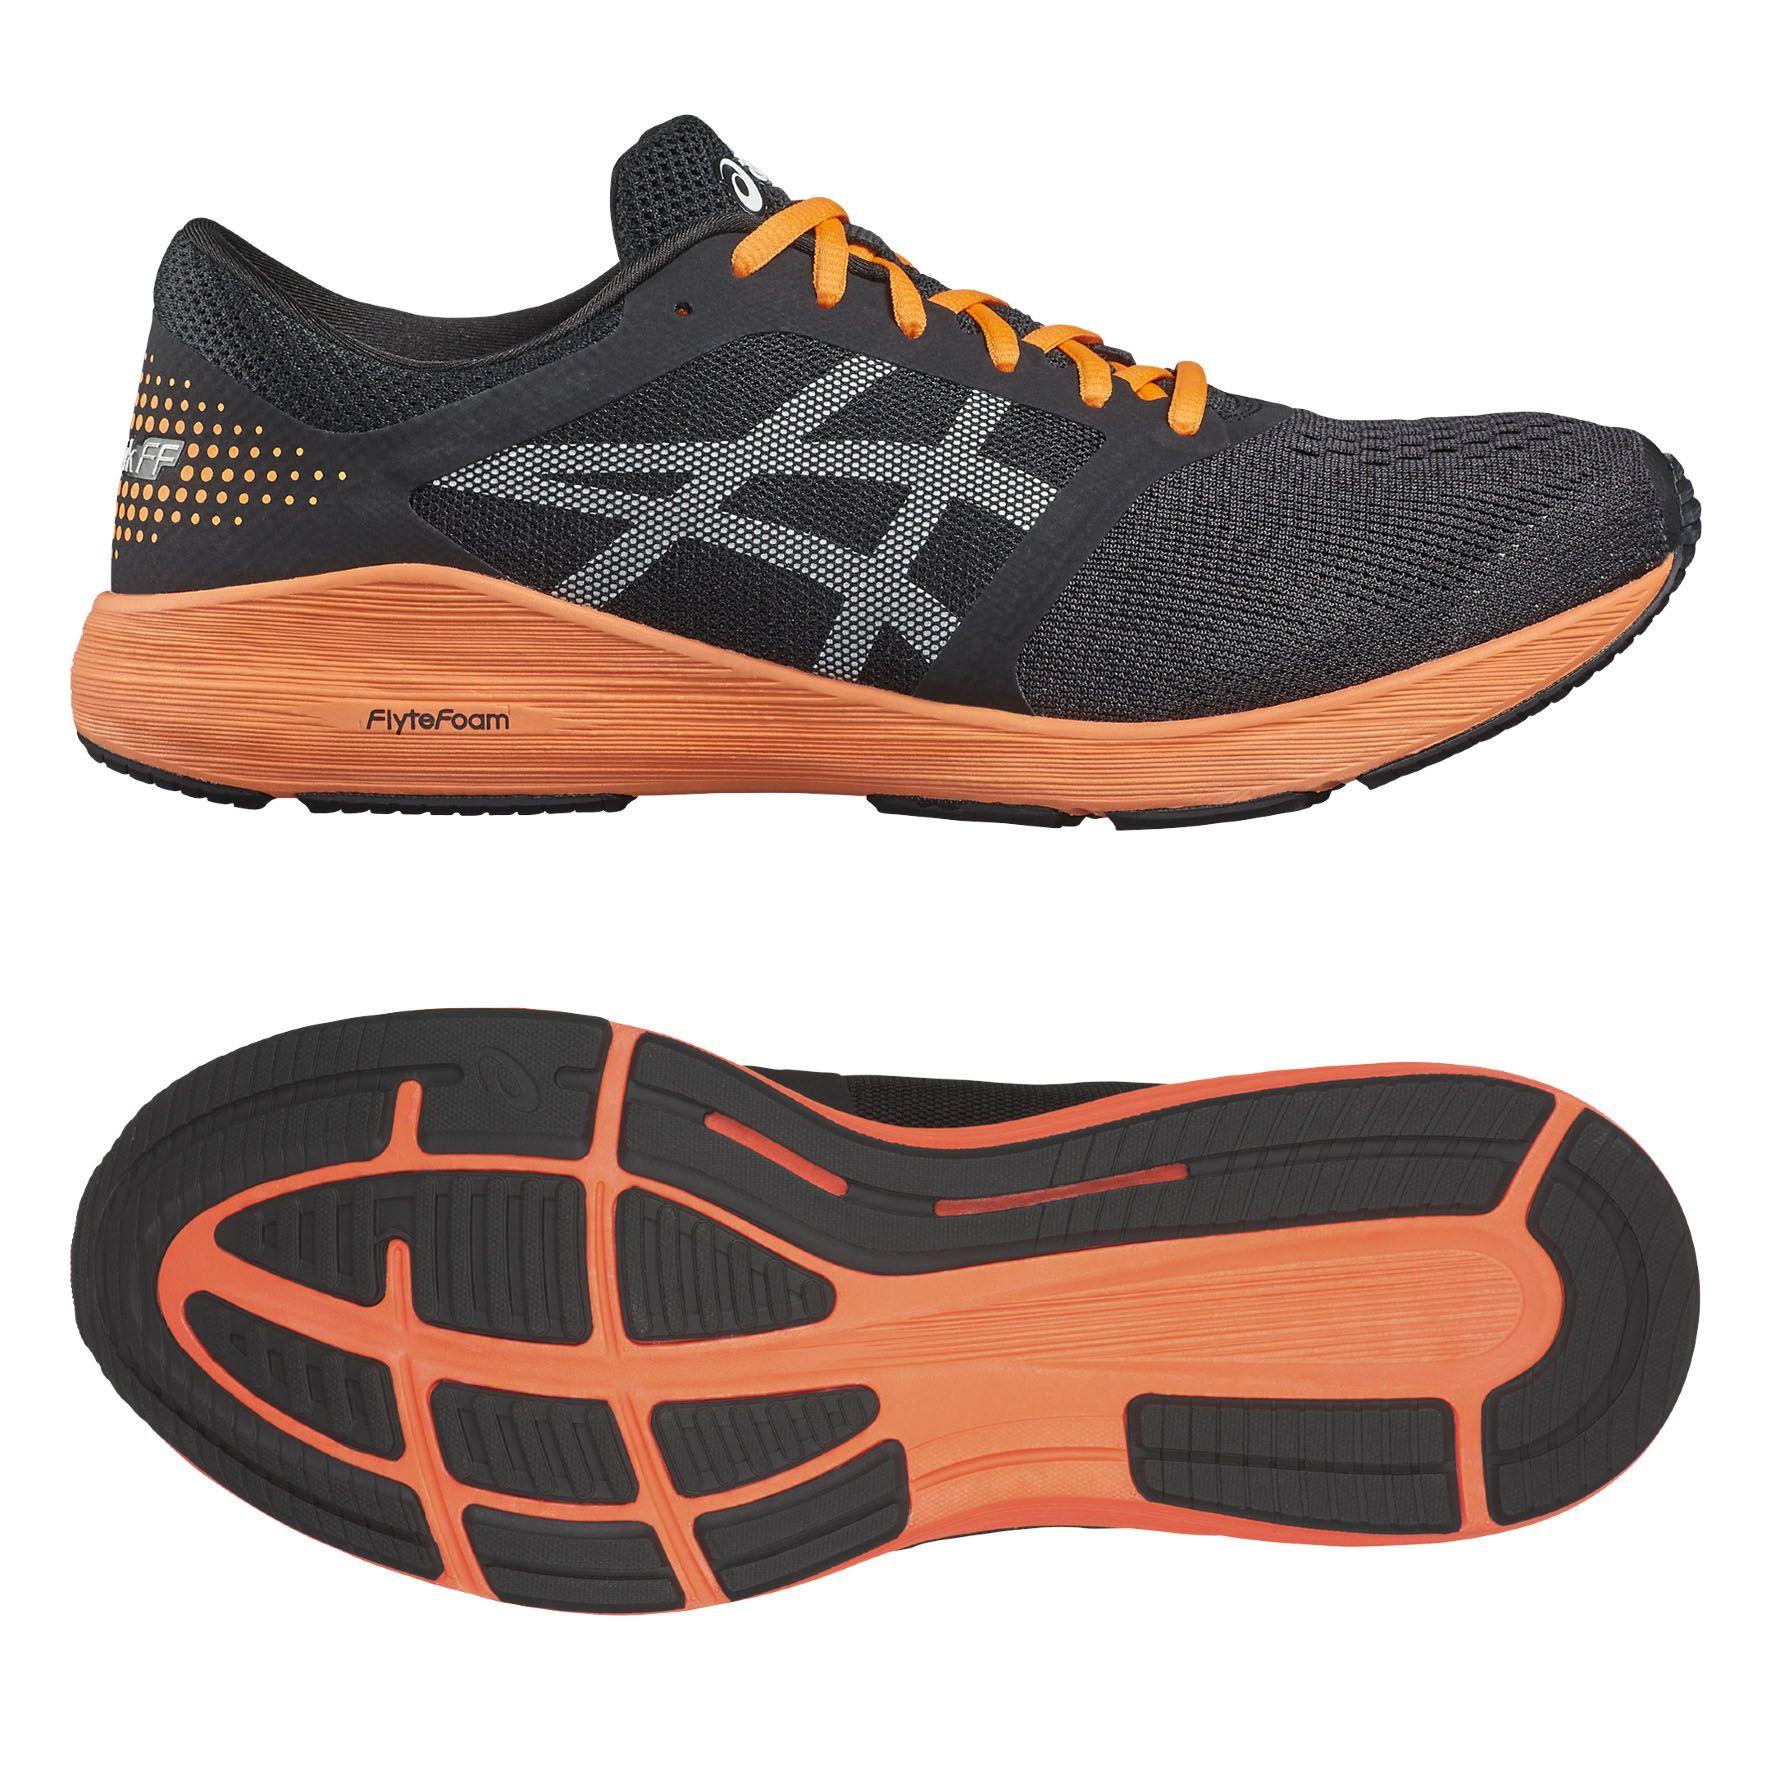 Lightweight Running Shoes For Overpronators